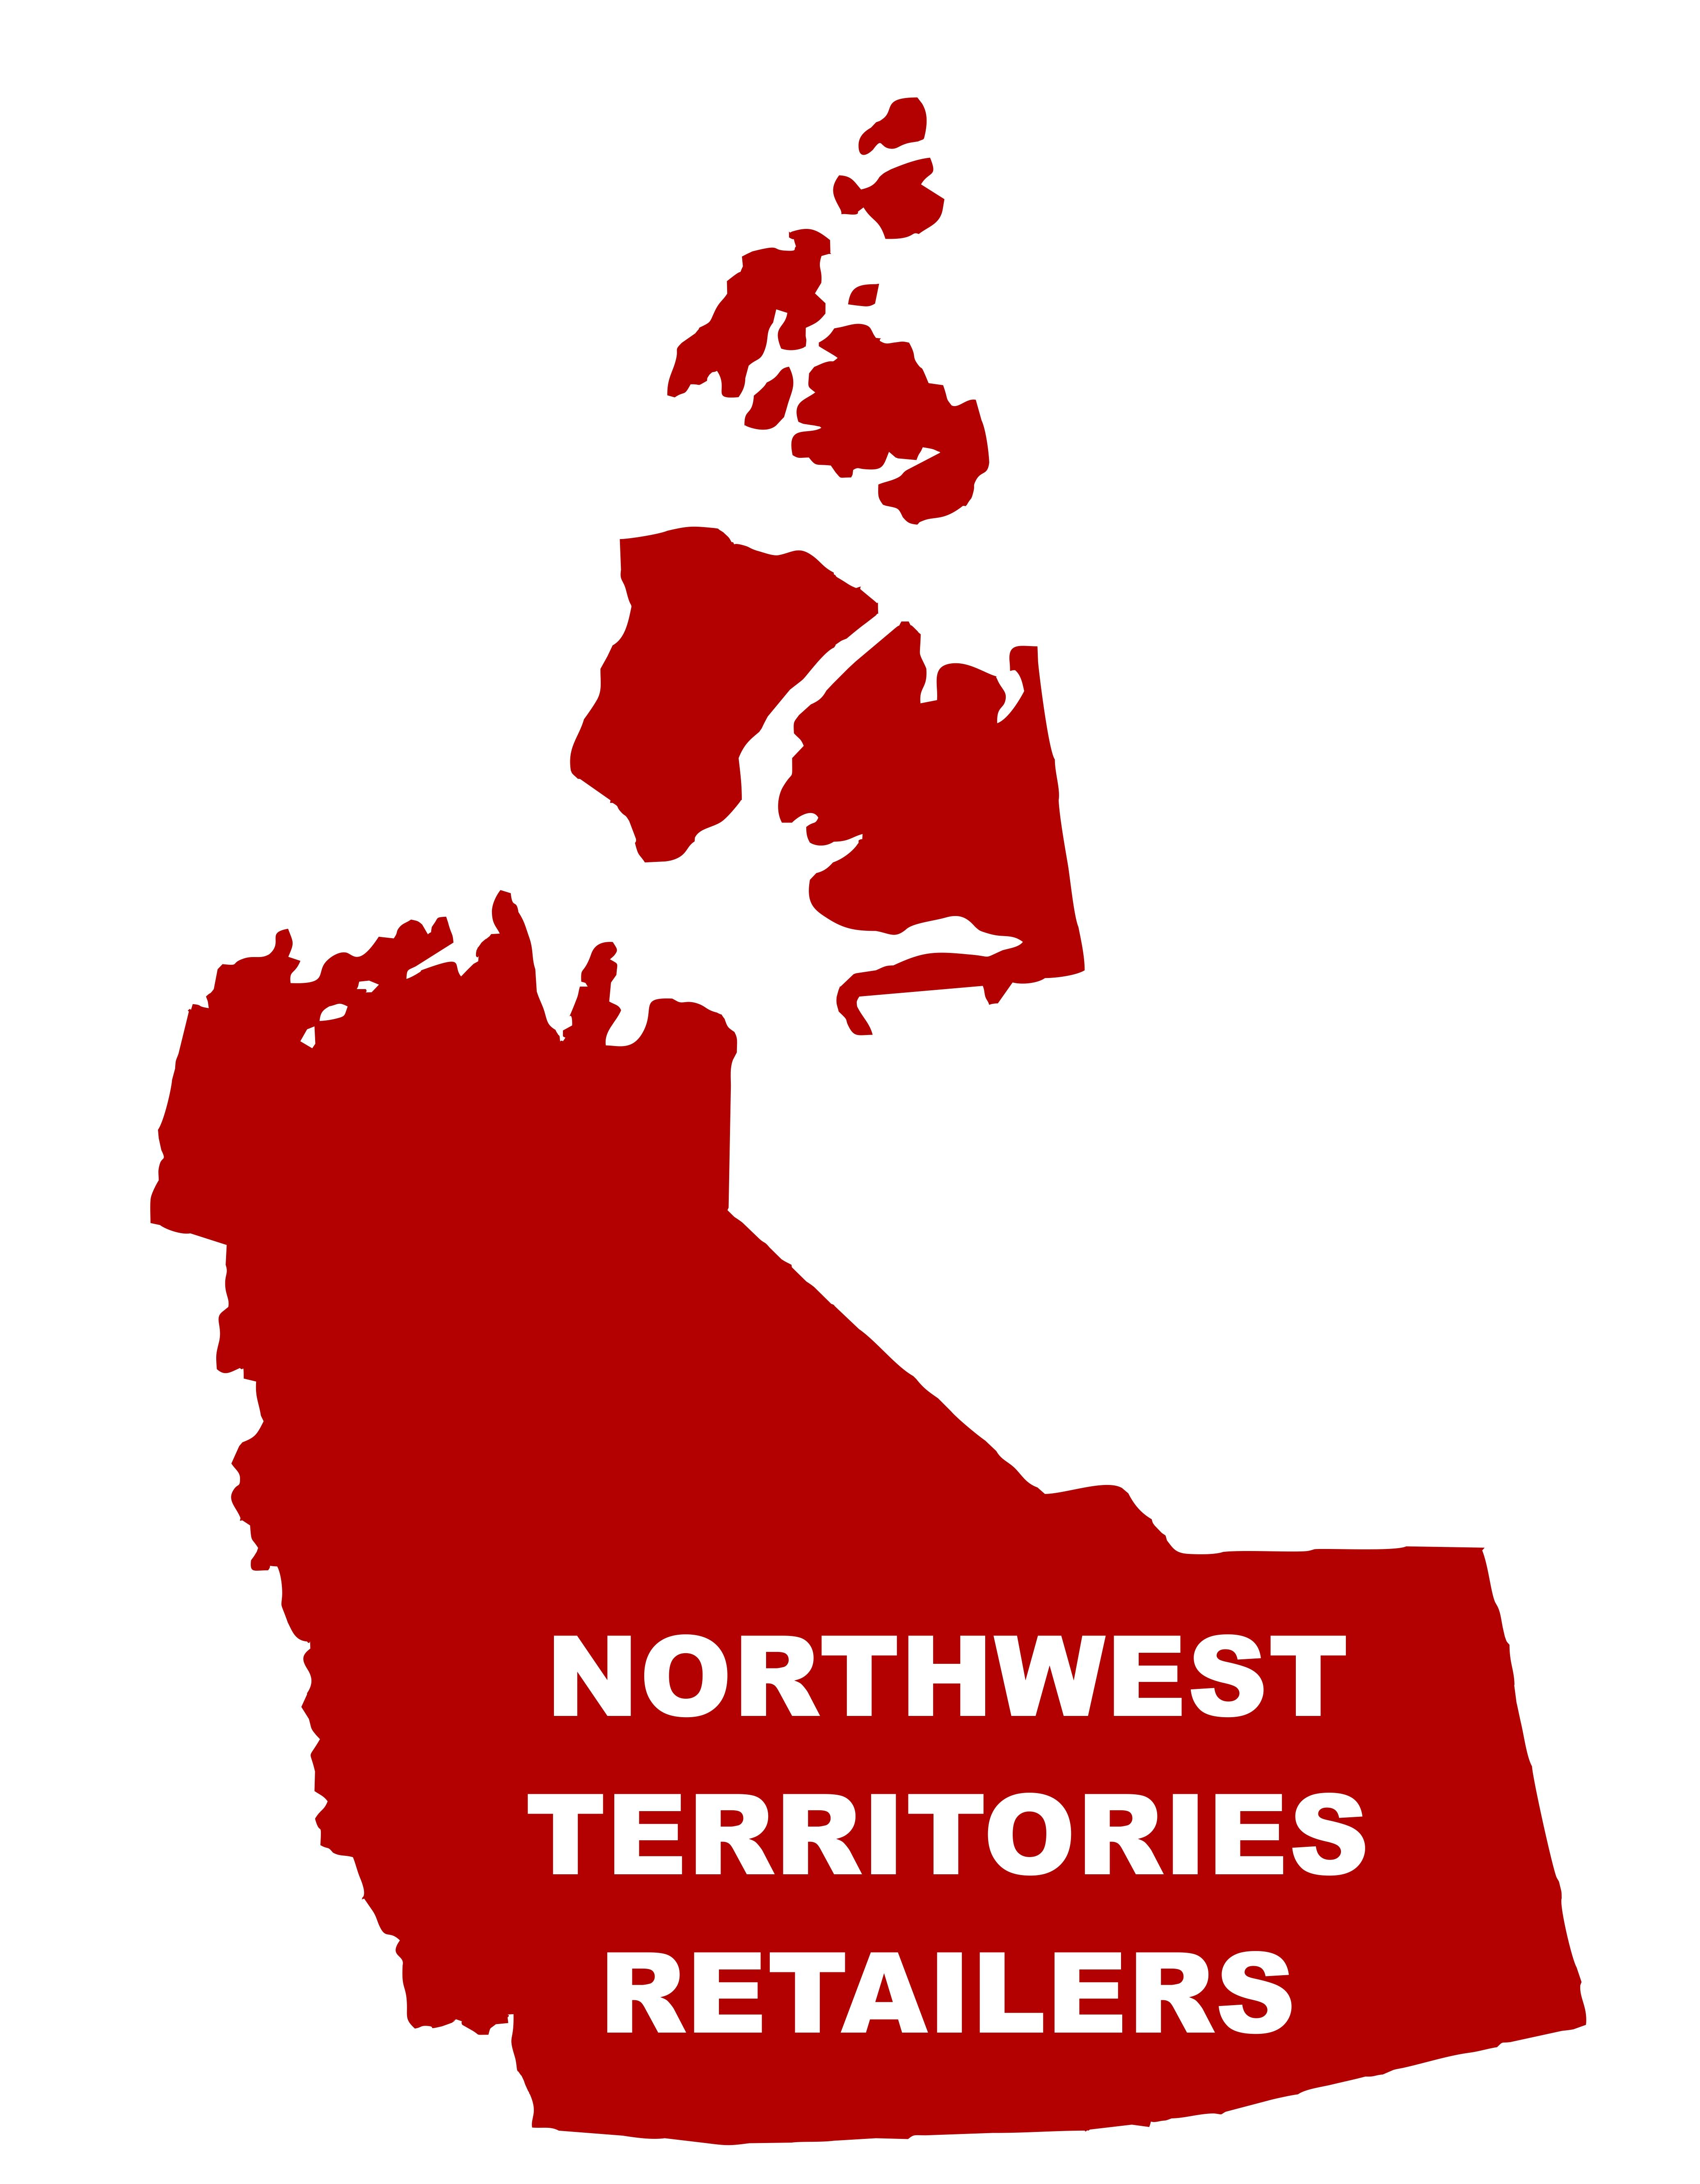 northwest-territories-retailers.jpg